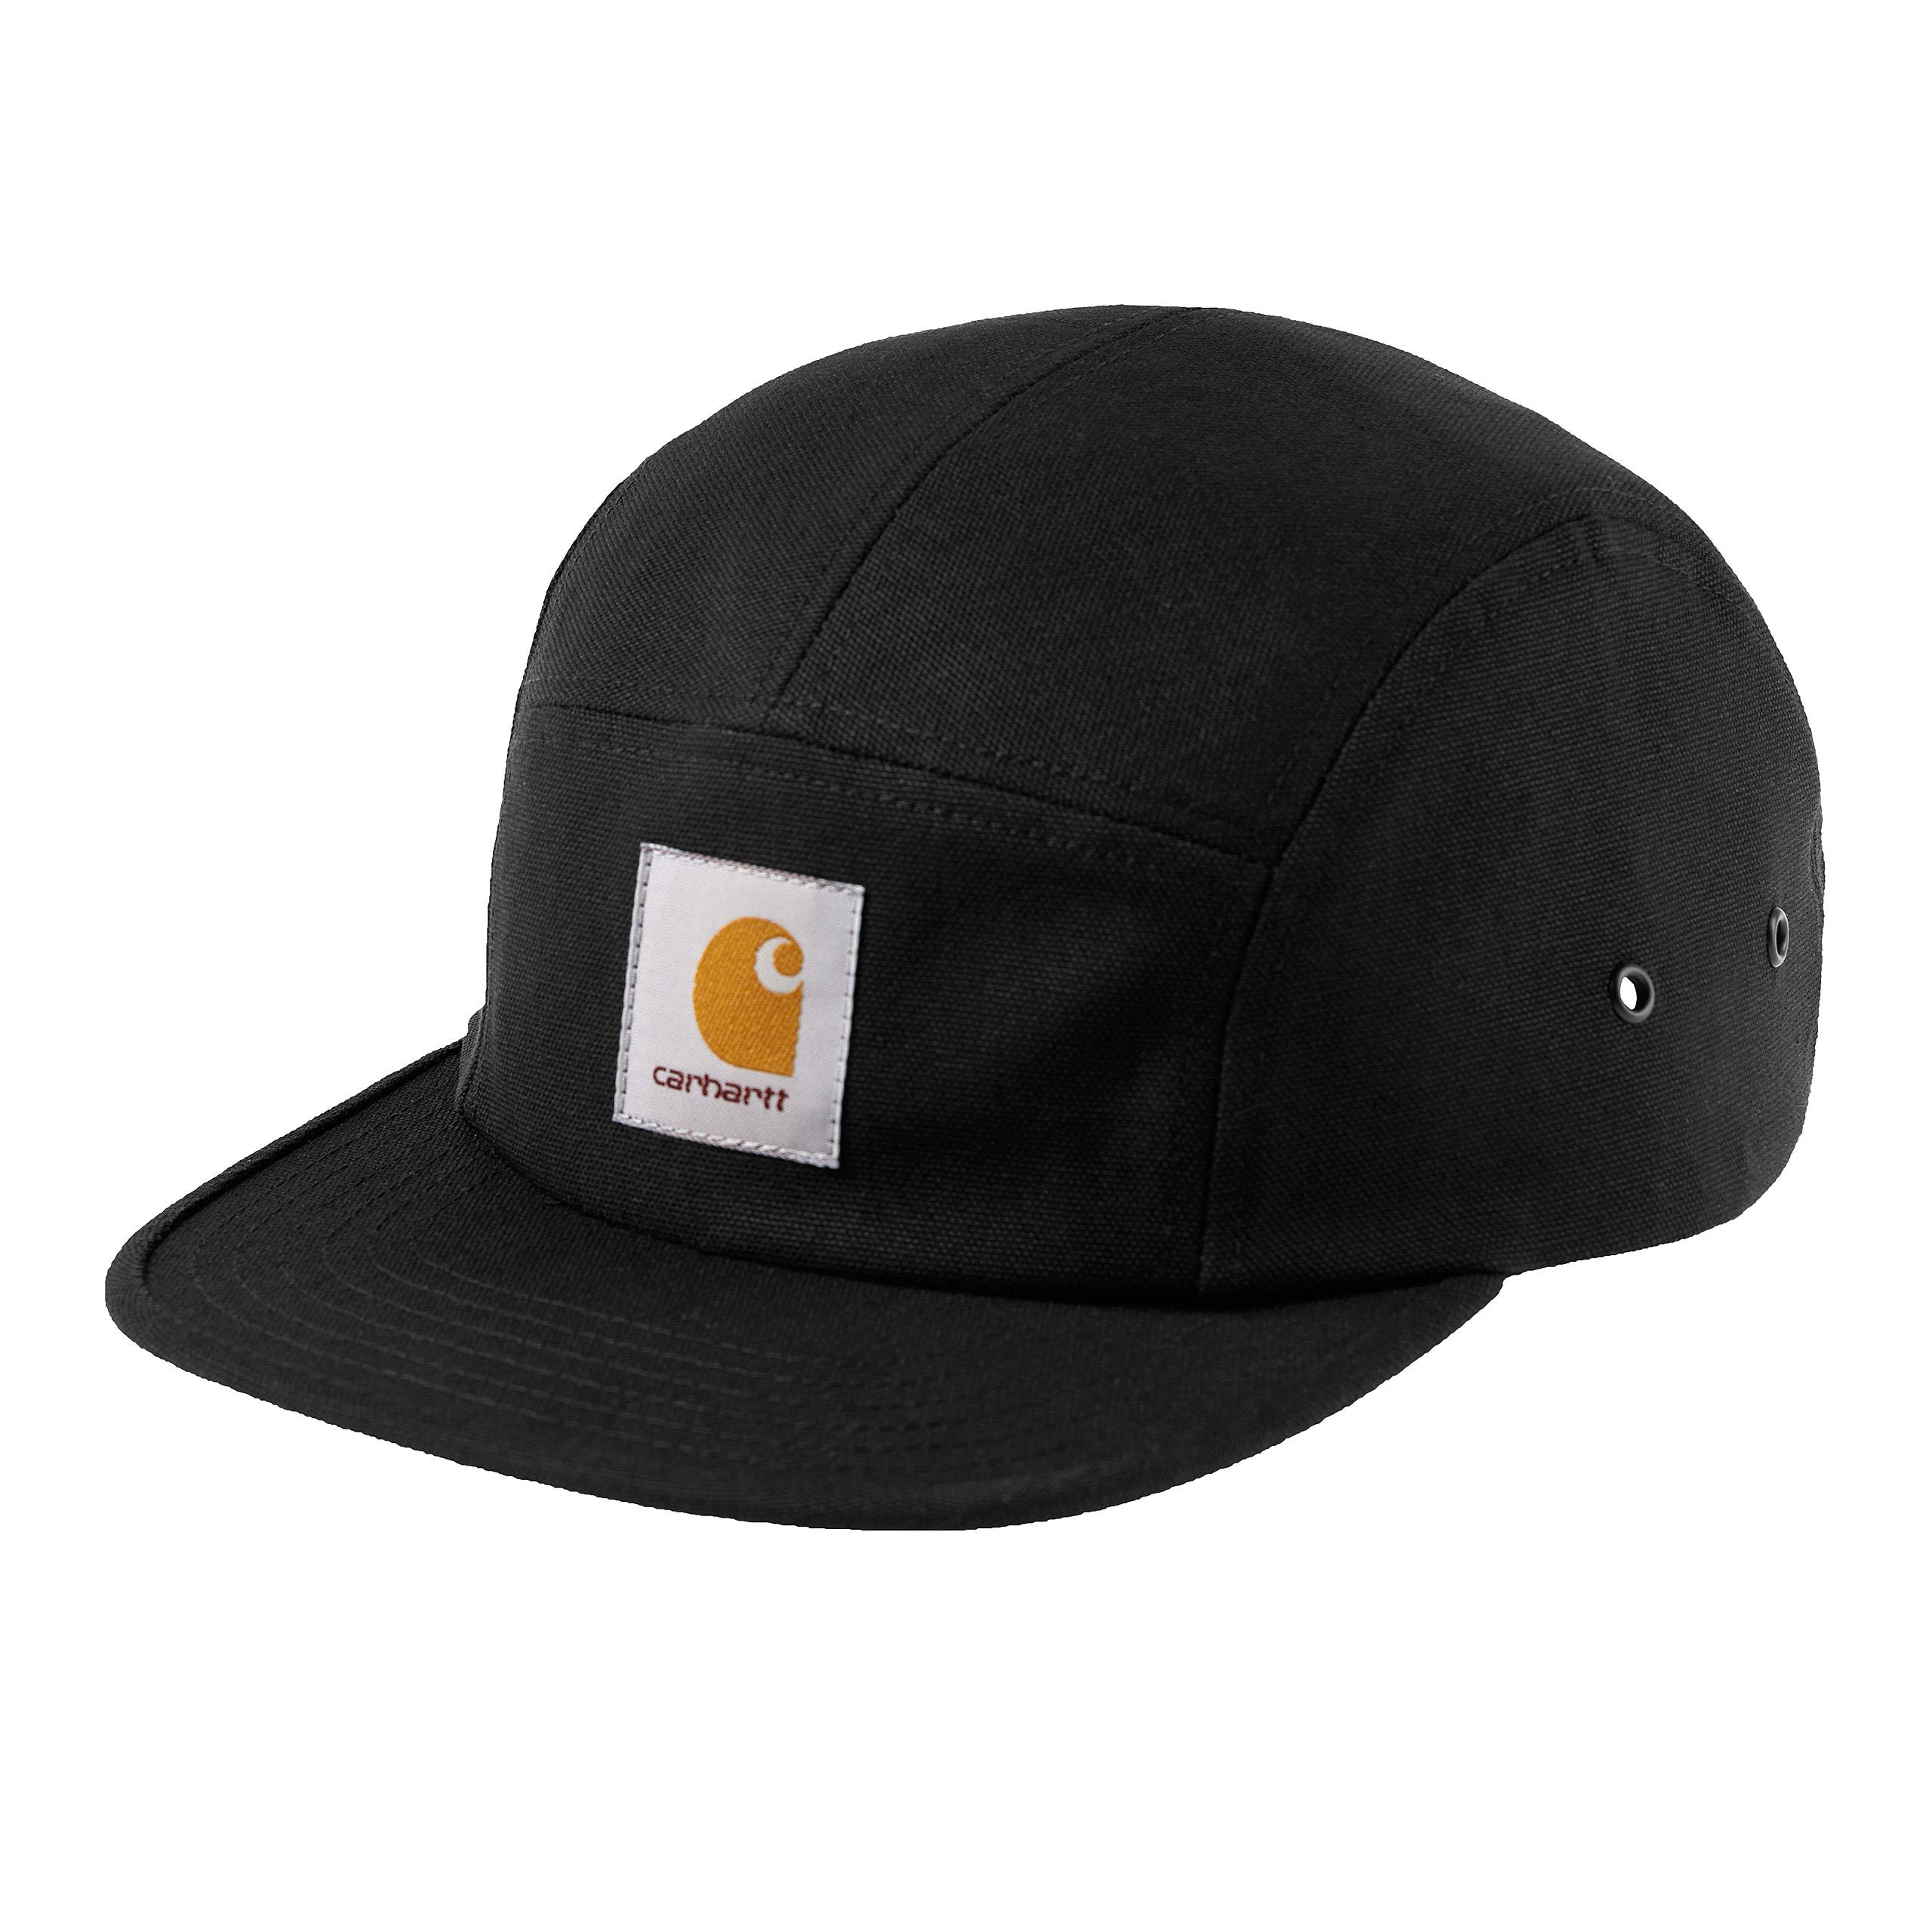 Carhartt WIP - BACKLEY CAP - Black